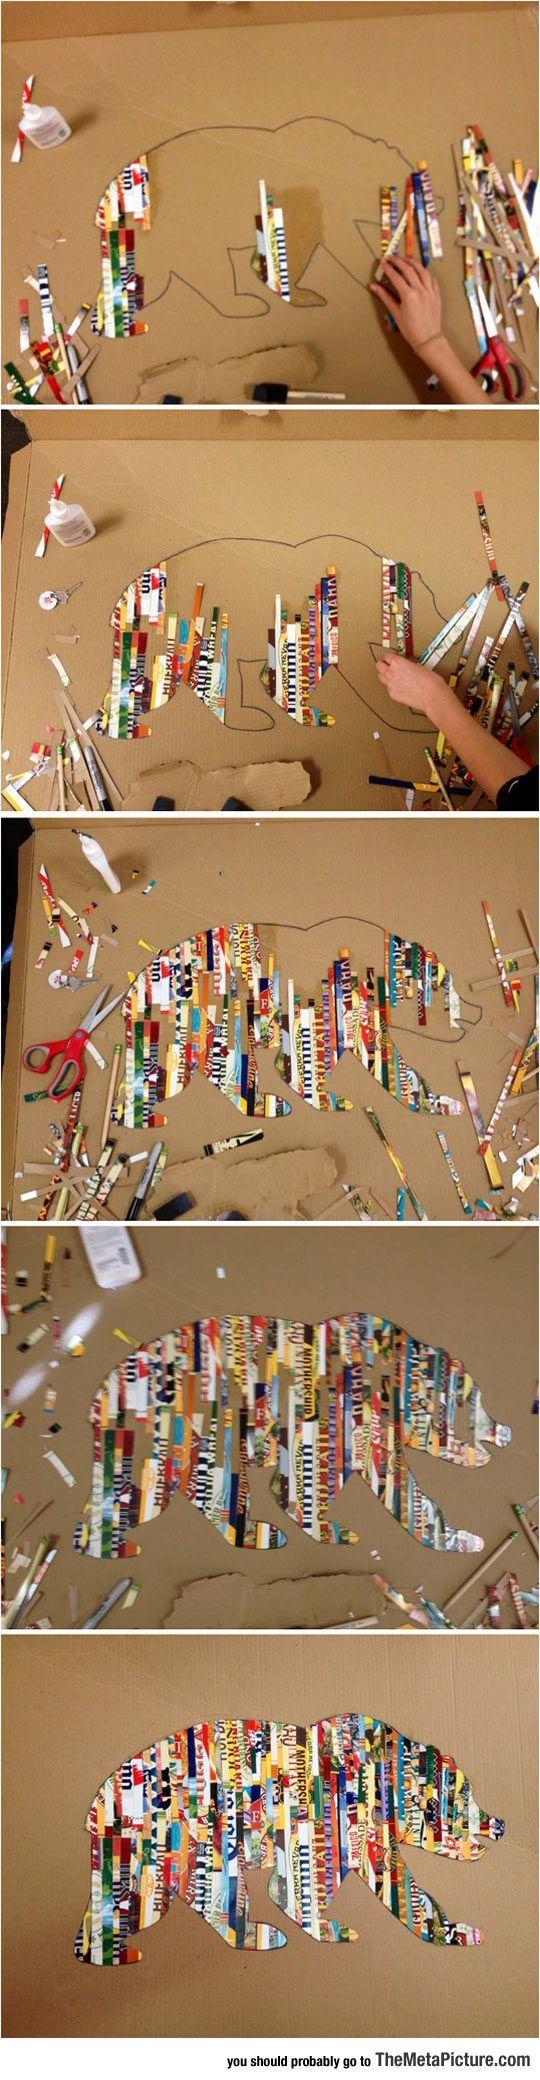 Paper Strip Art #art #cereal #artistic #paper art http://www.adorabo.com/view/paper-strip-art